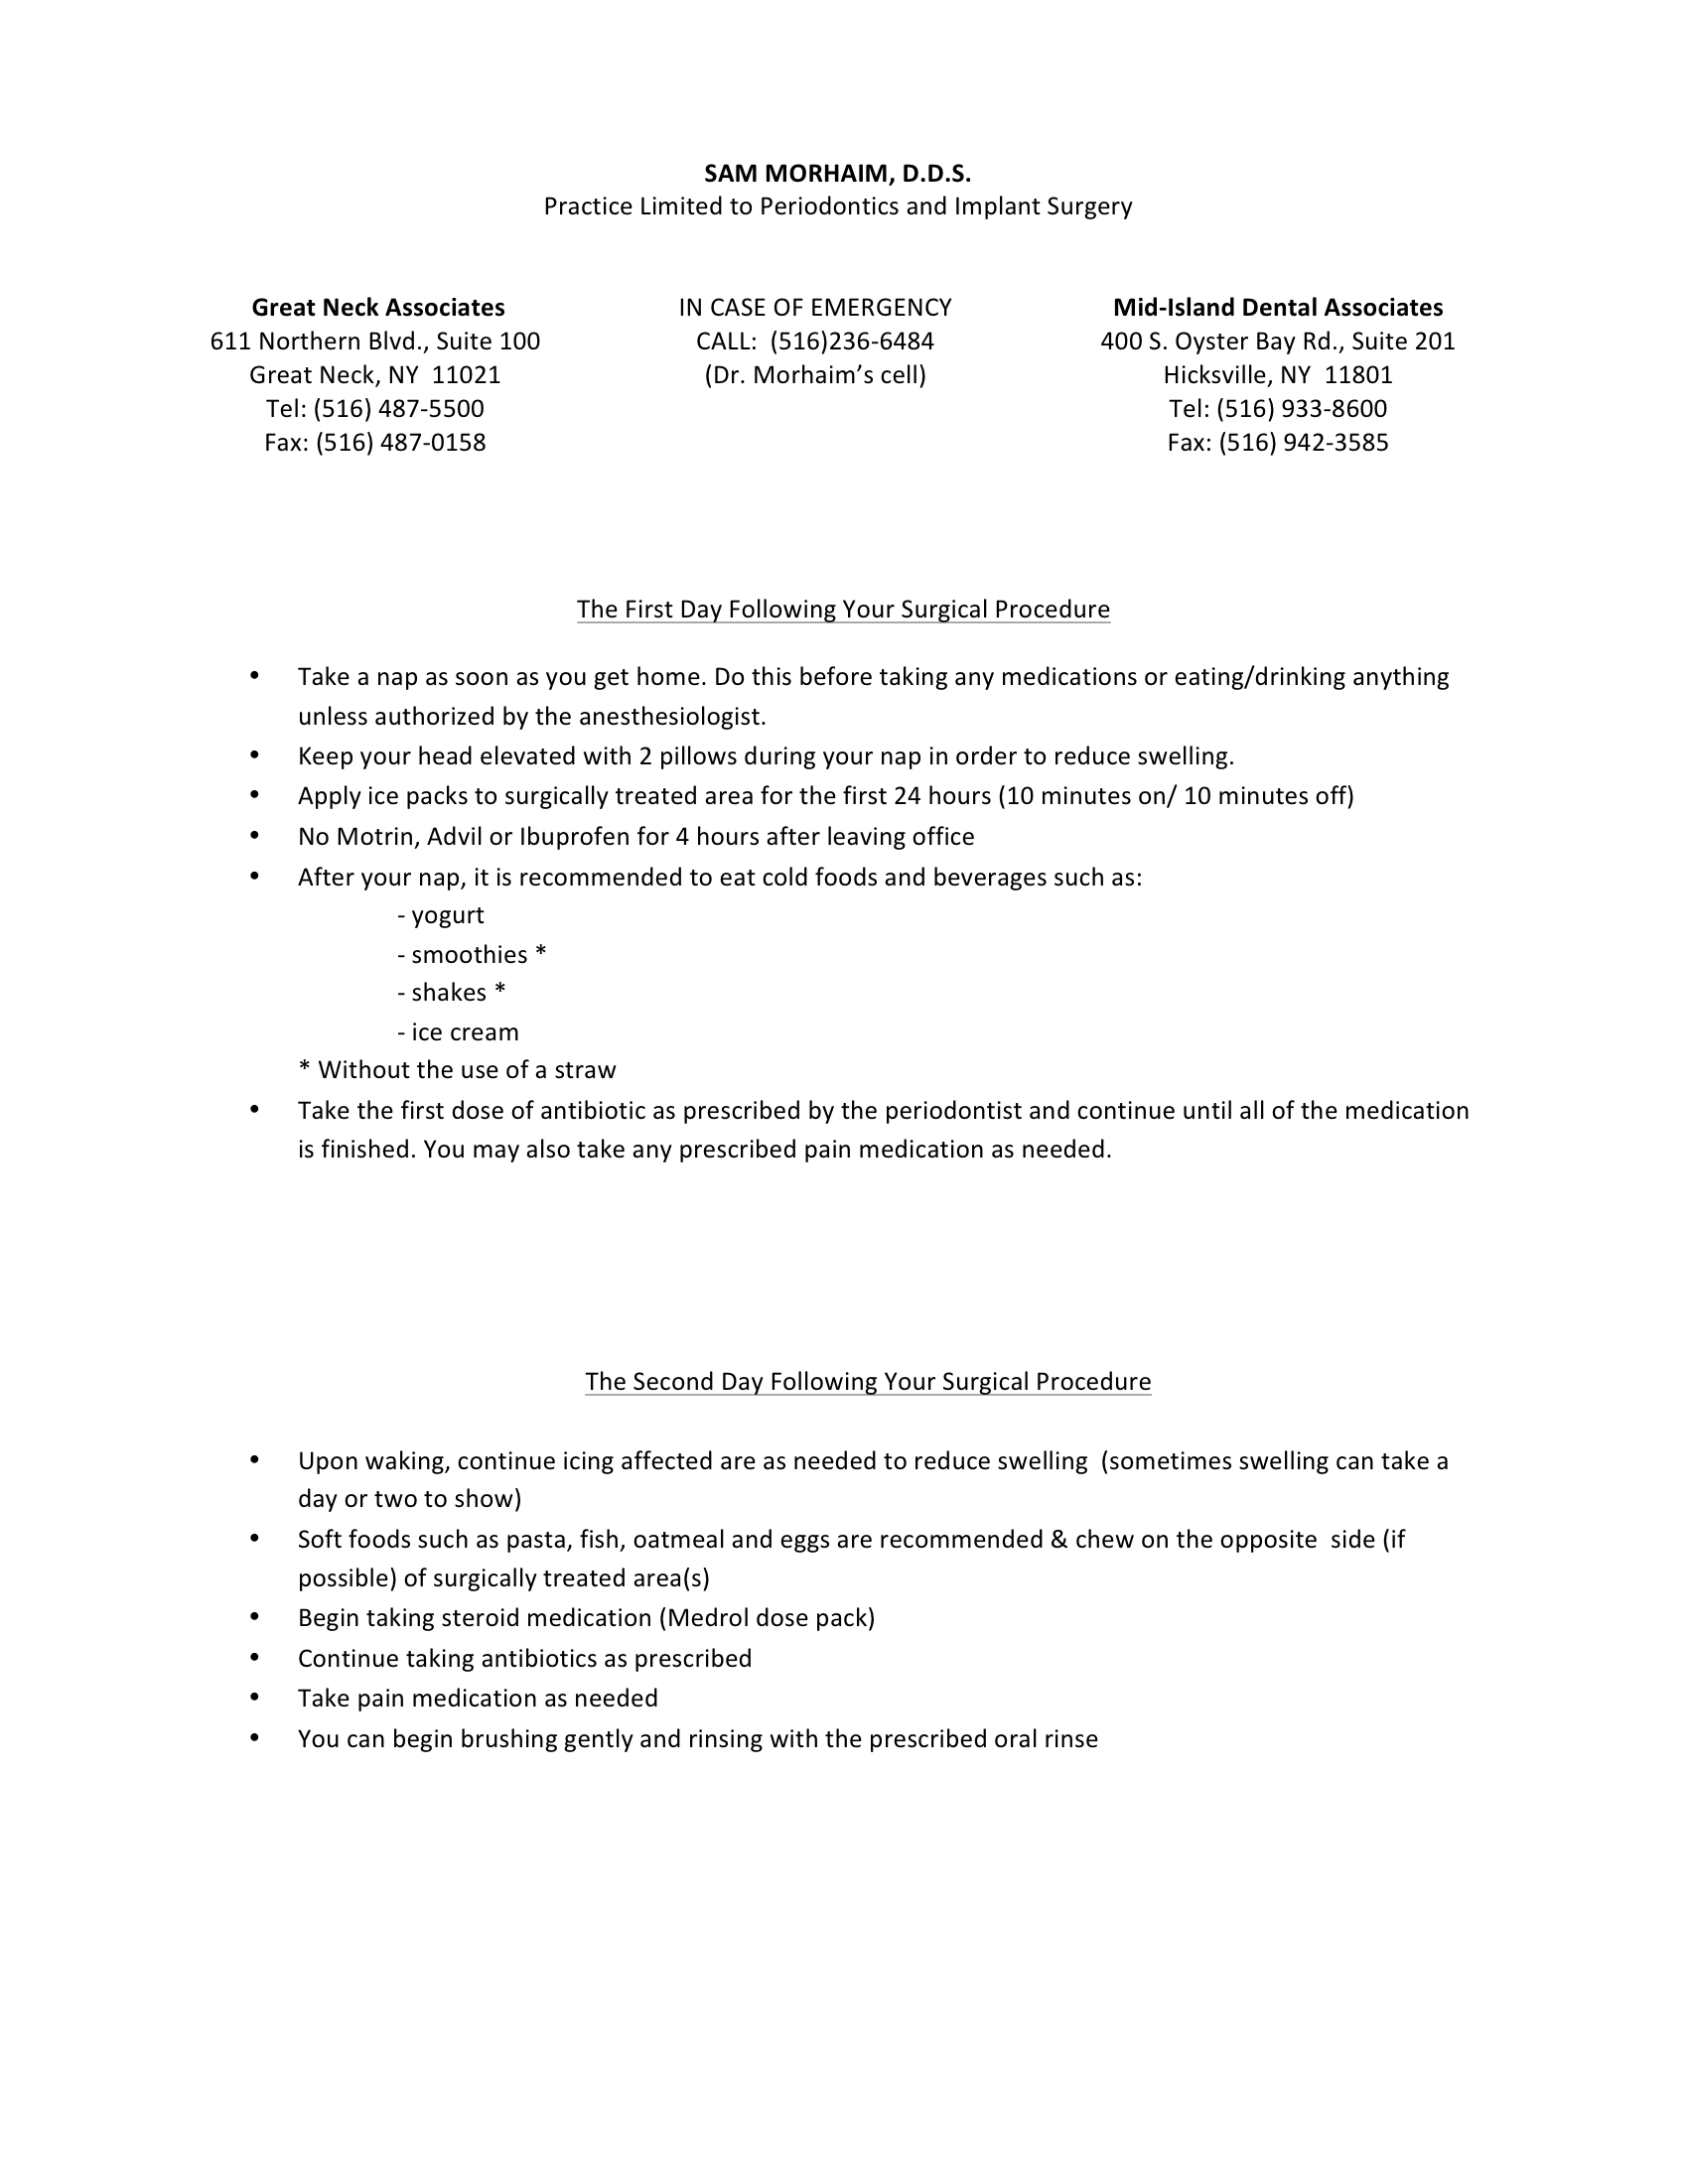 Procedures Requiring Sedation